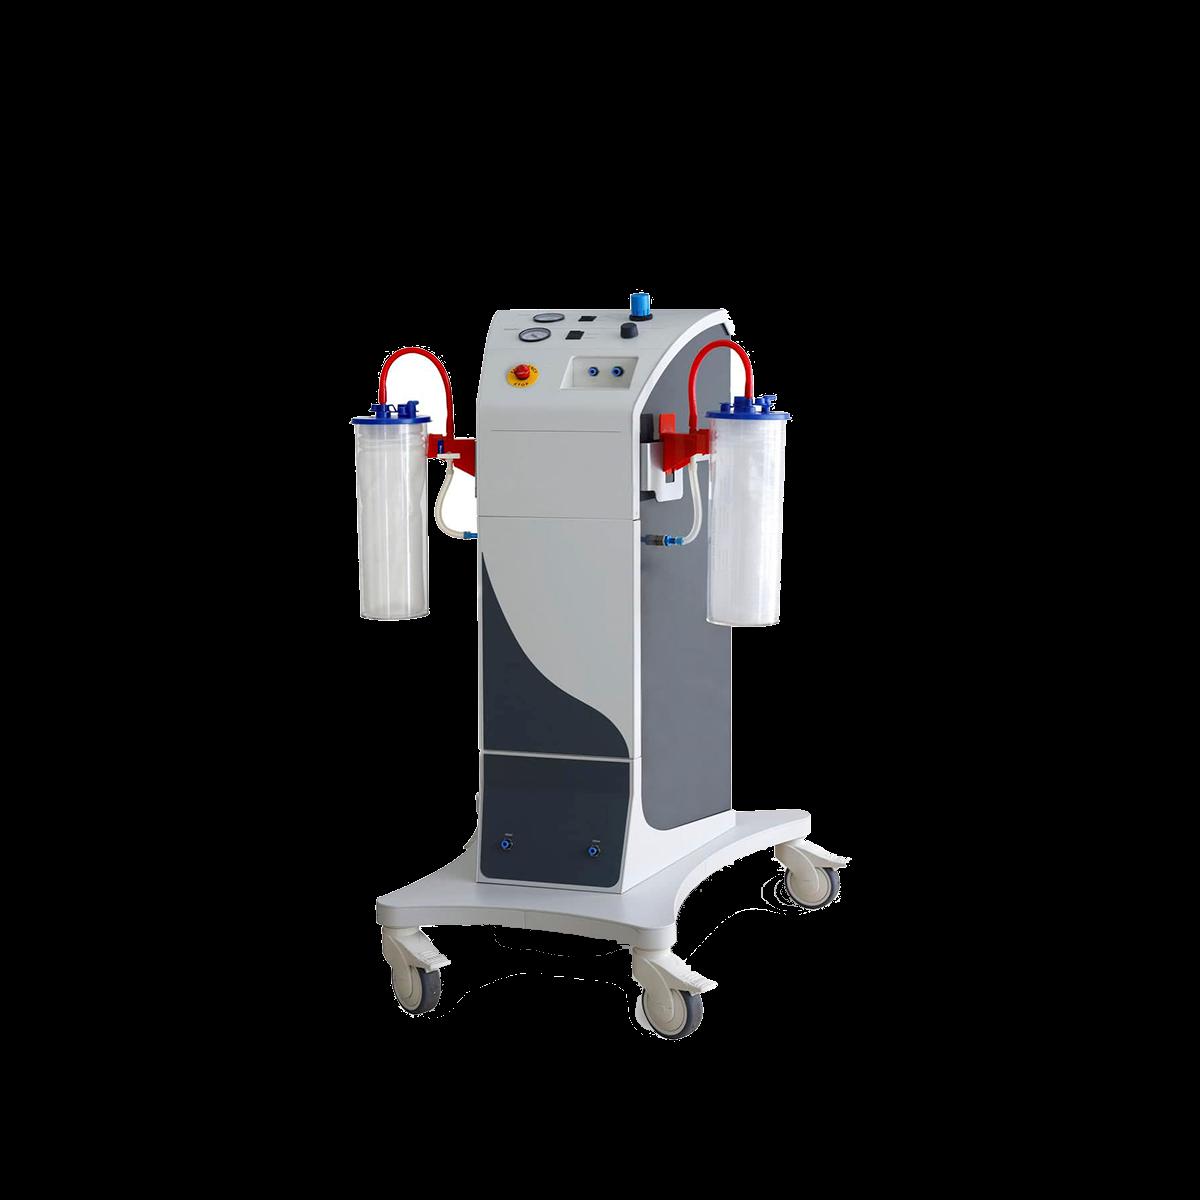 Liposuction pump